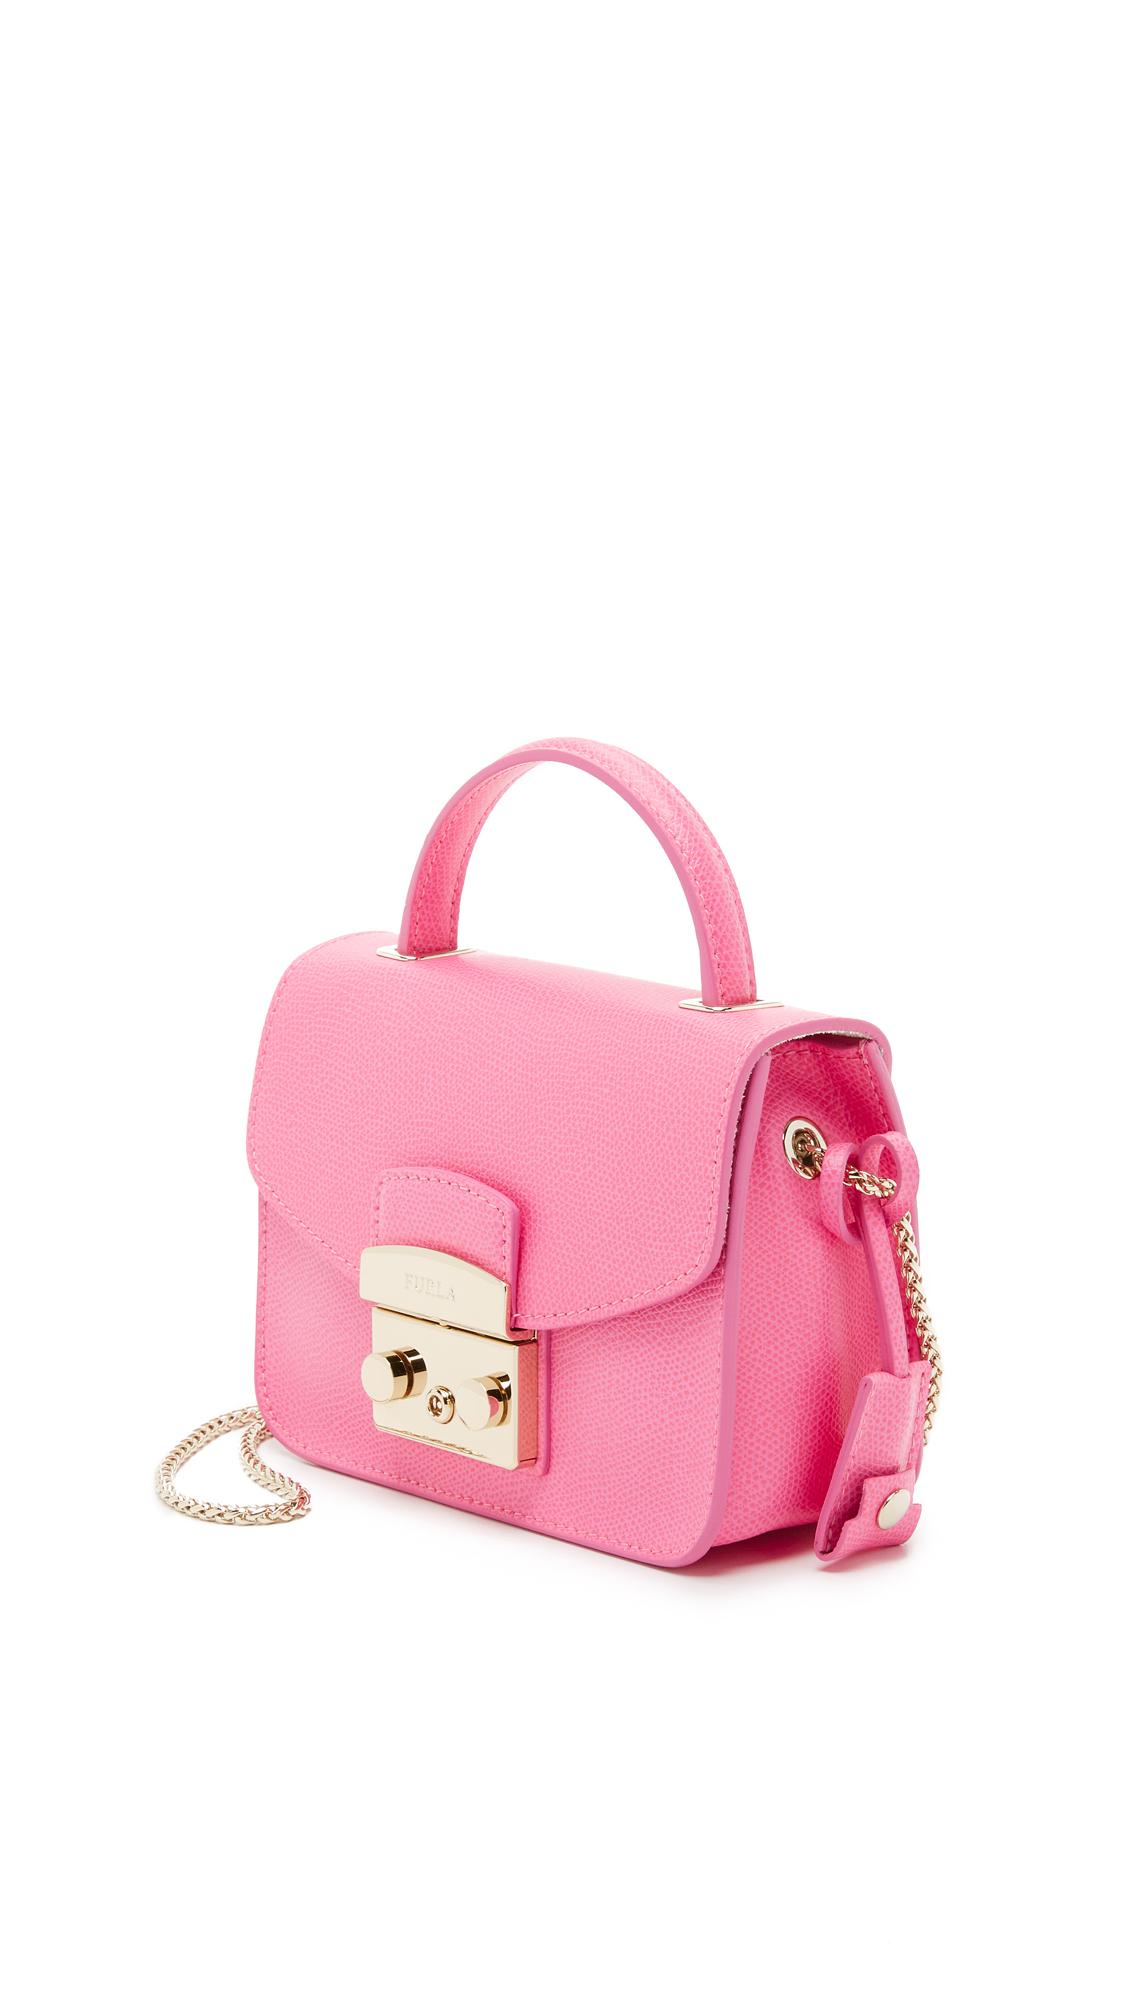 lyst furla metropolis mini cross body bag in pink. Black Bedroom Furniture Sets. Home Design Ideas